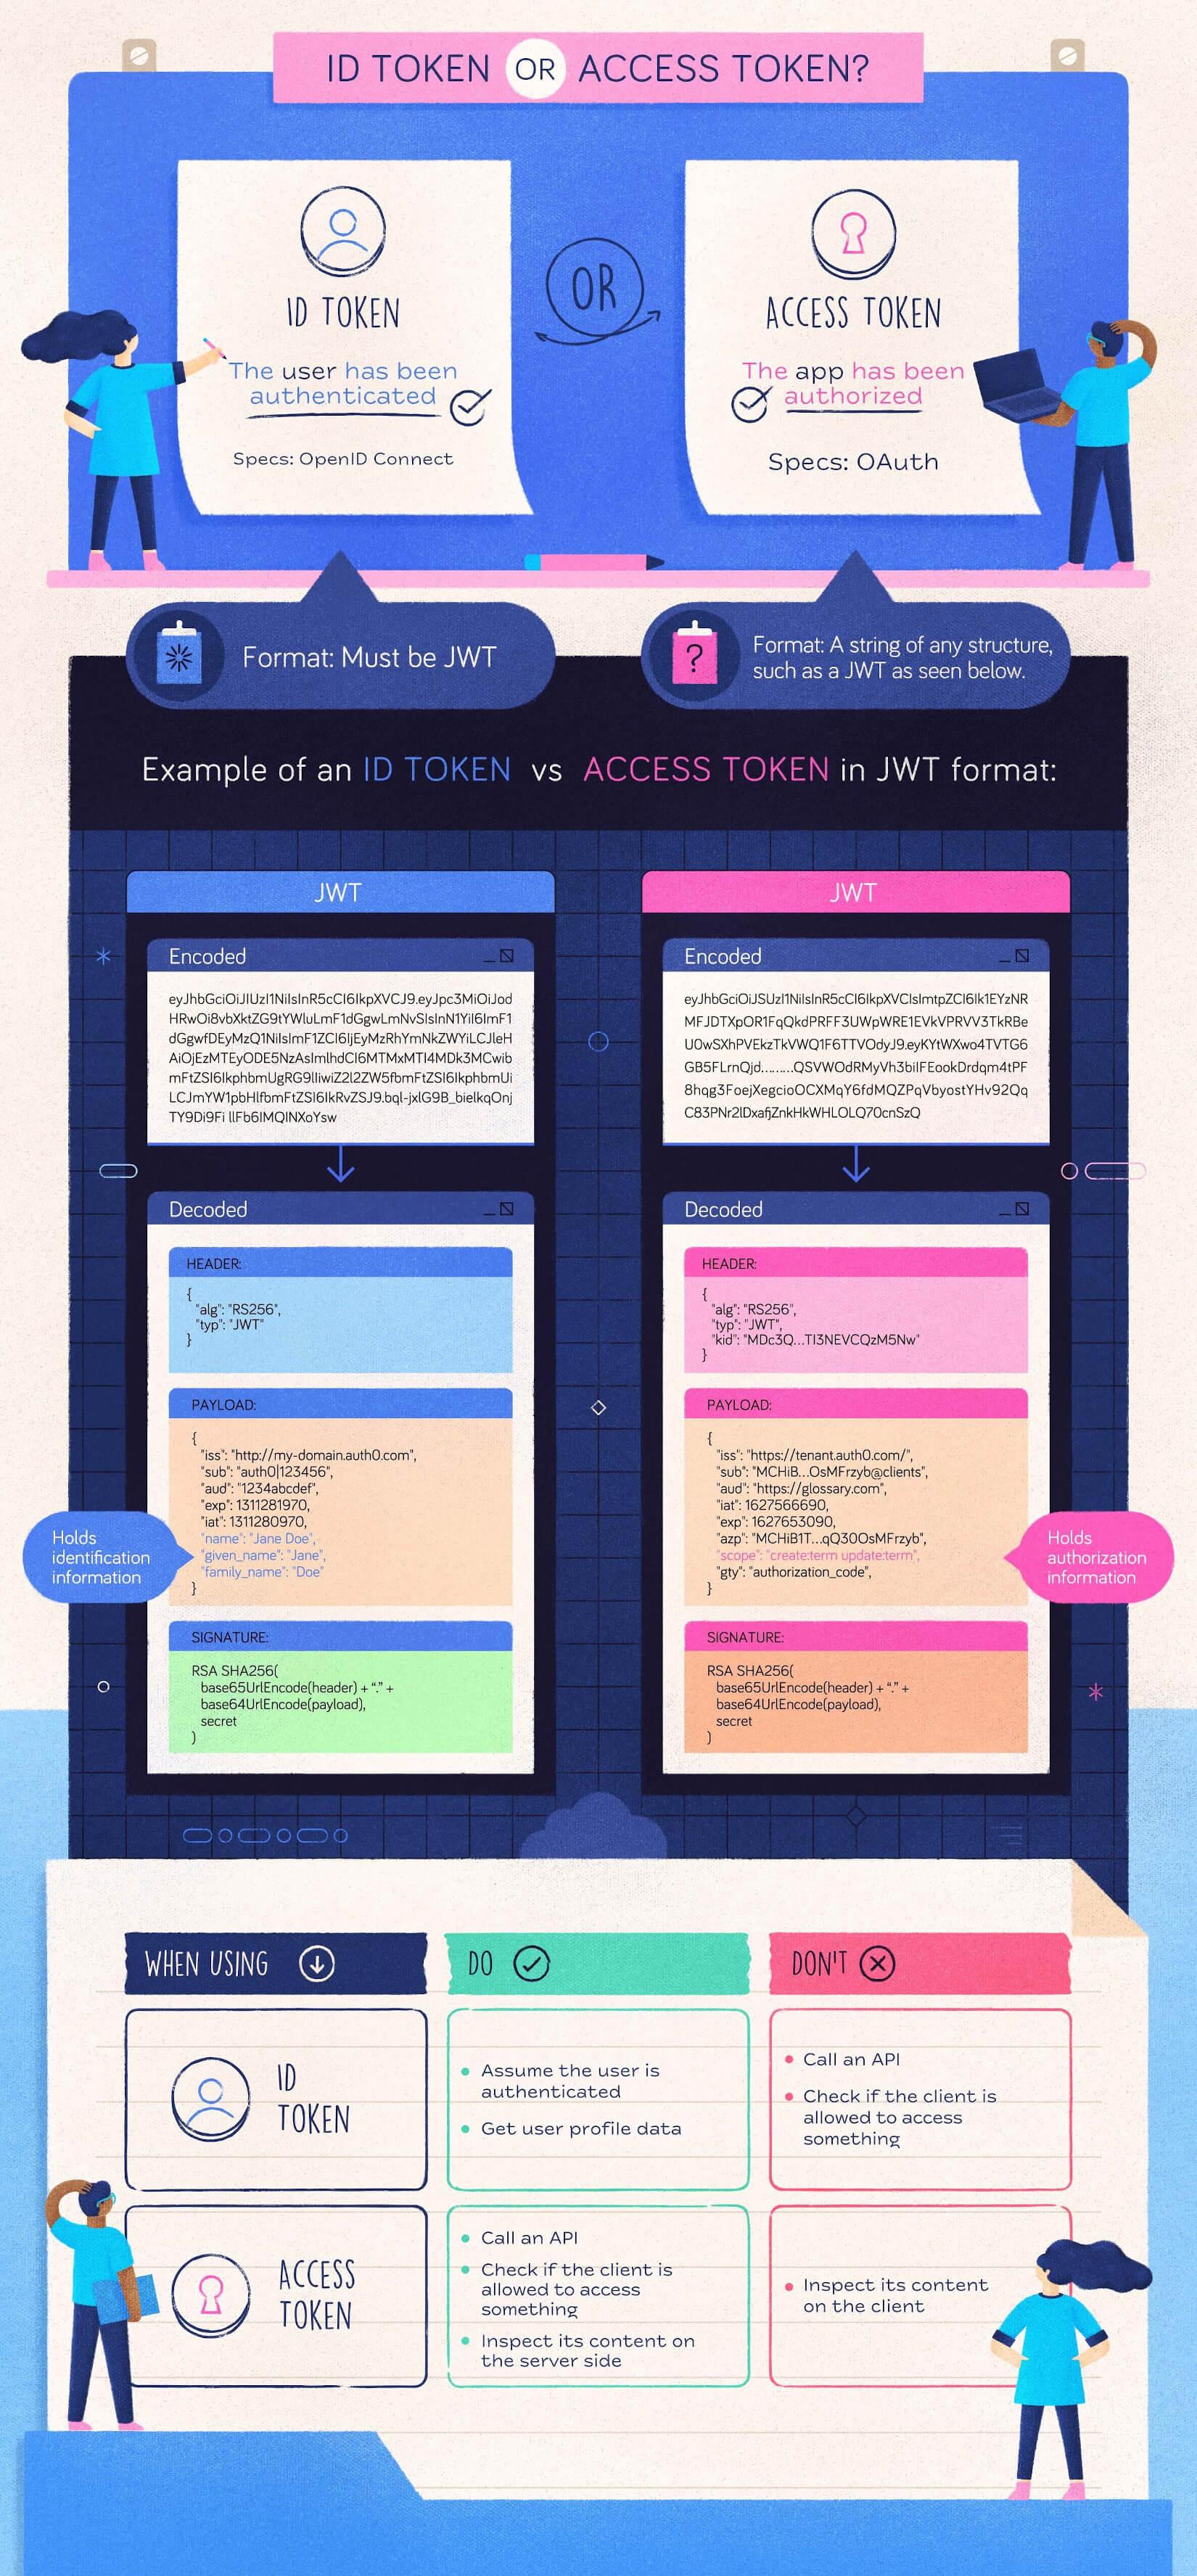 ID token vs access token